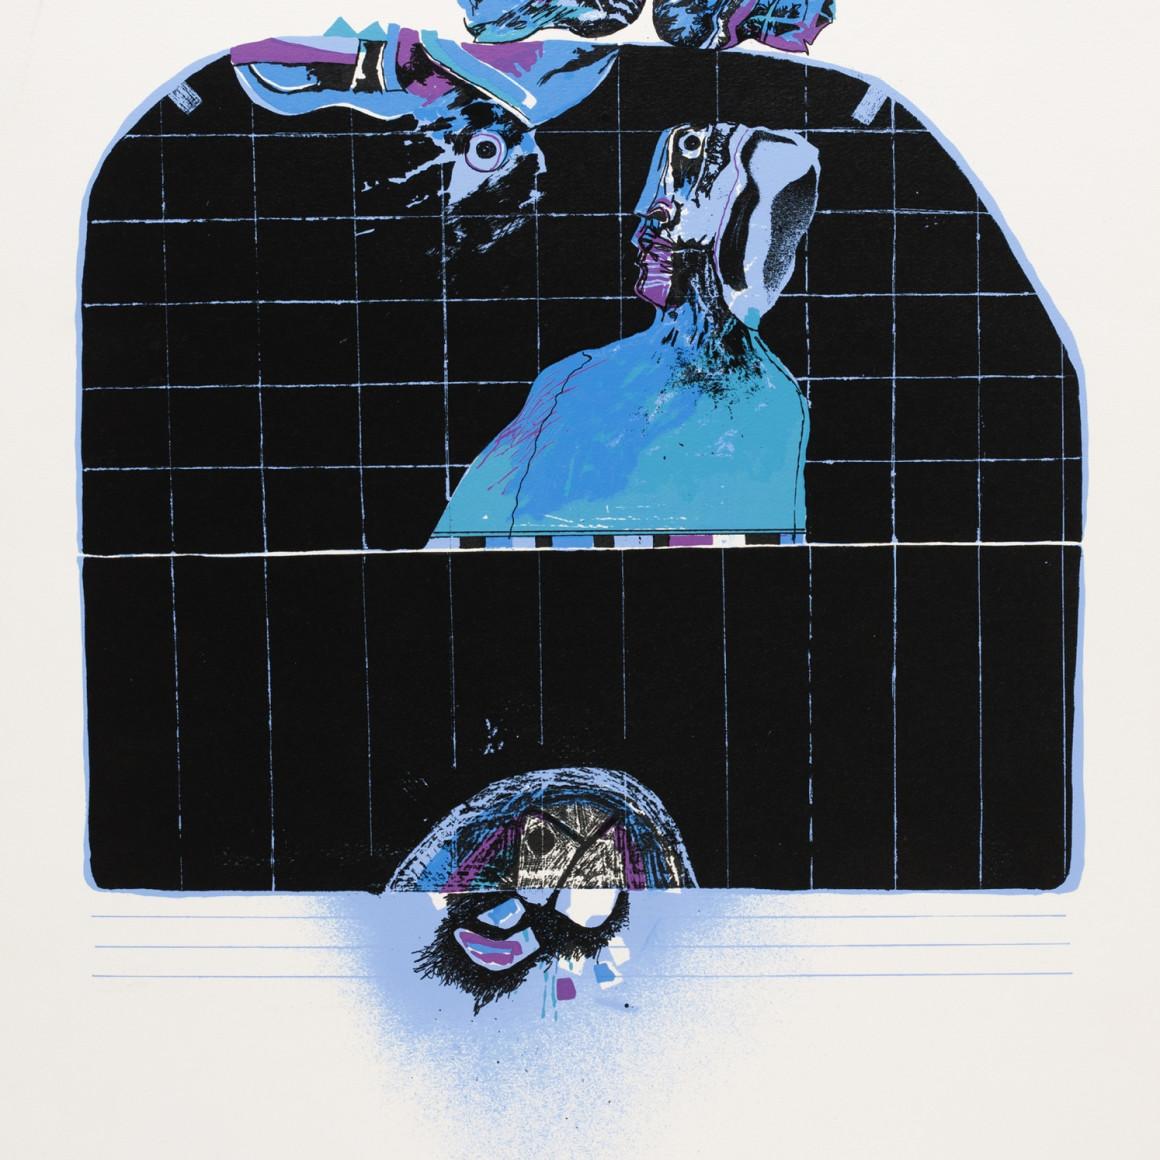 Dia al-Azzawi, Man and Two Birds, 1978